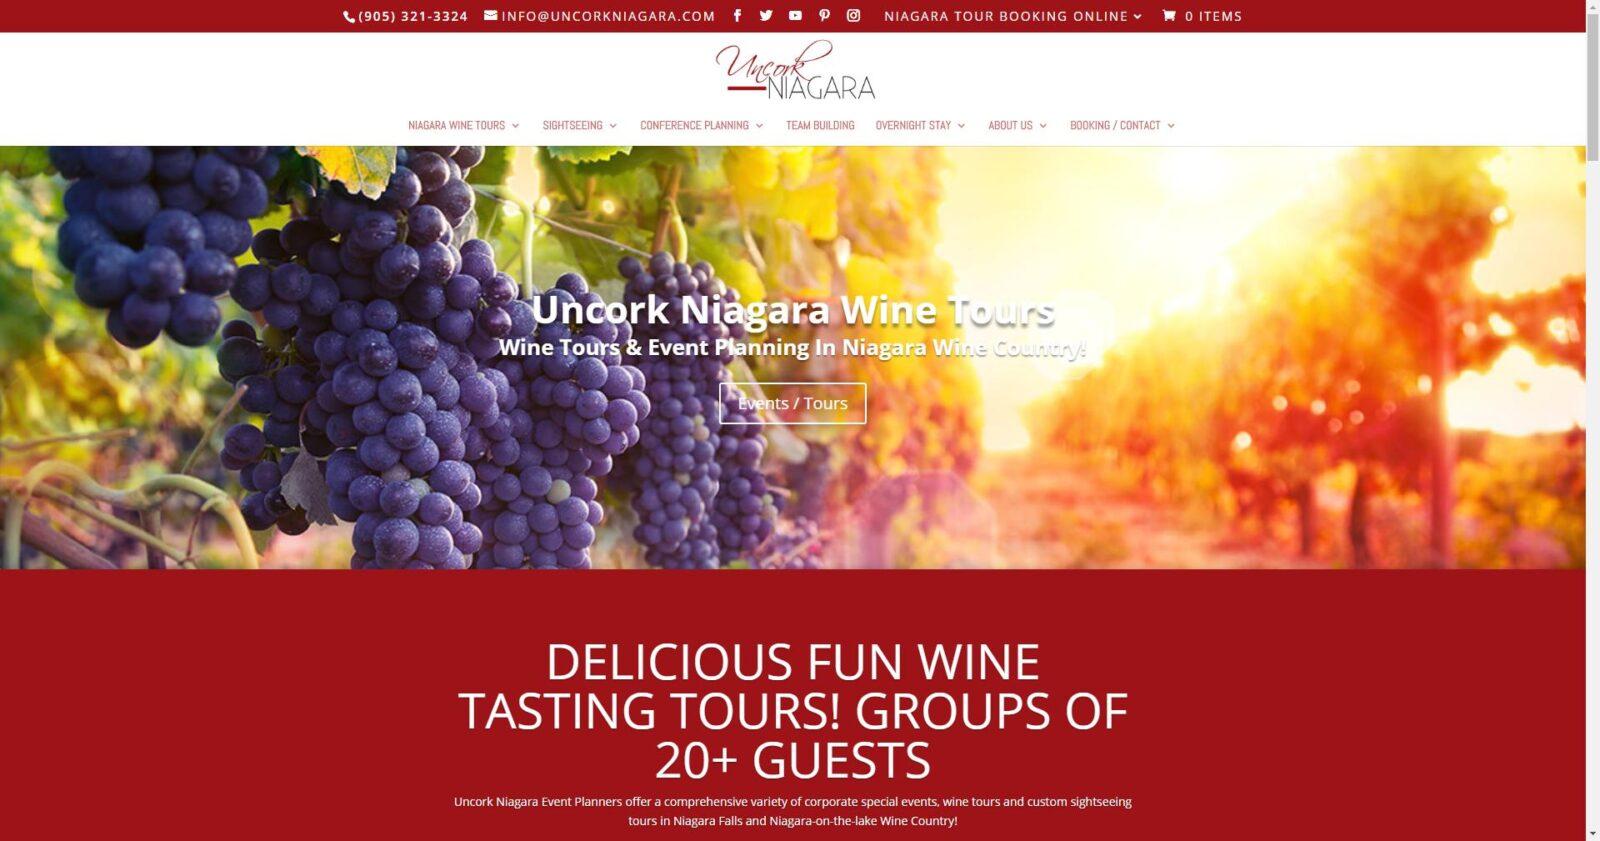 Uncork Niagara Wine Tours